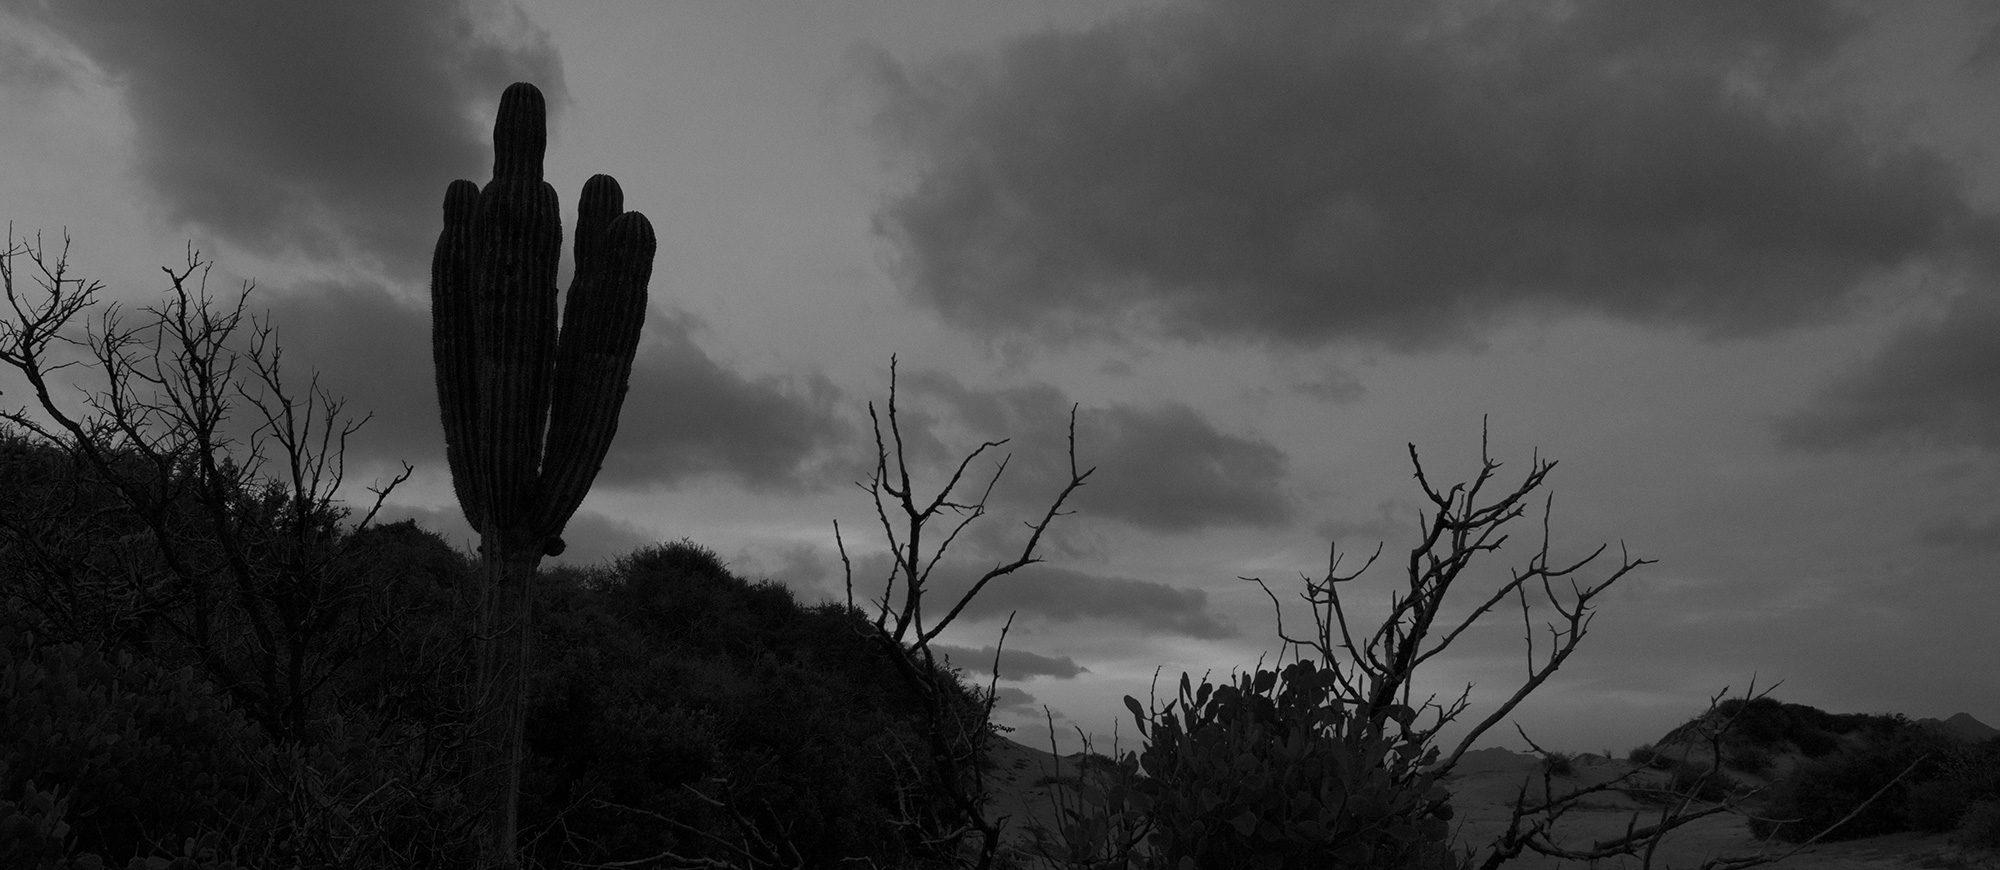 Cabo Pulmo National Park, Baja California - Mexico